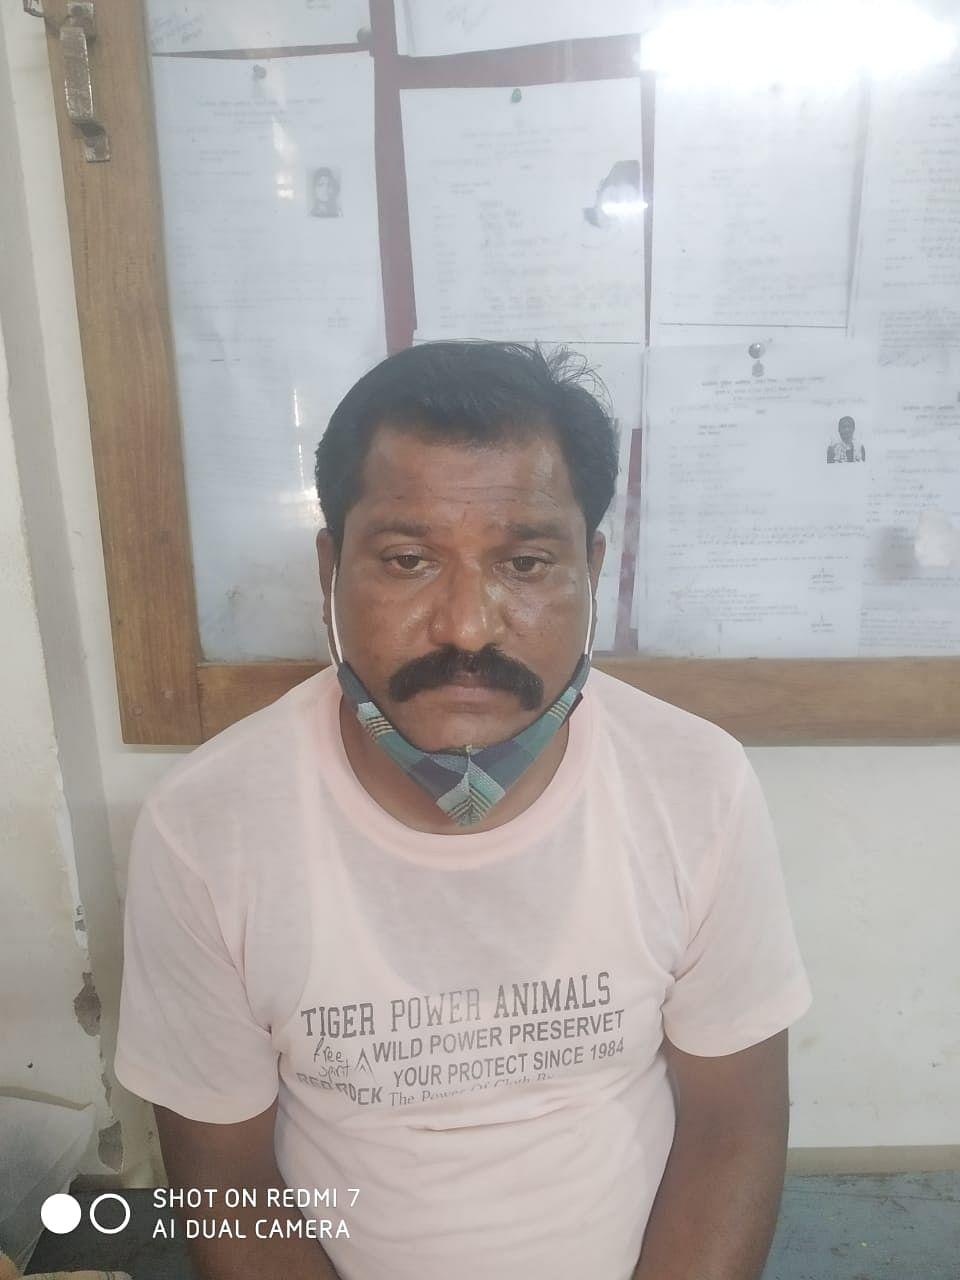 नाबालिग बच्ची से छेड़छाड़ का आरोपी गिरफ्तार